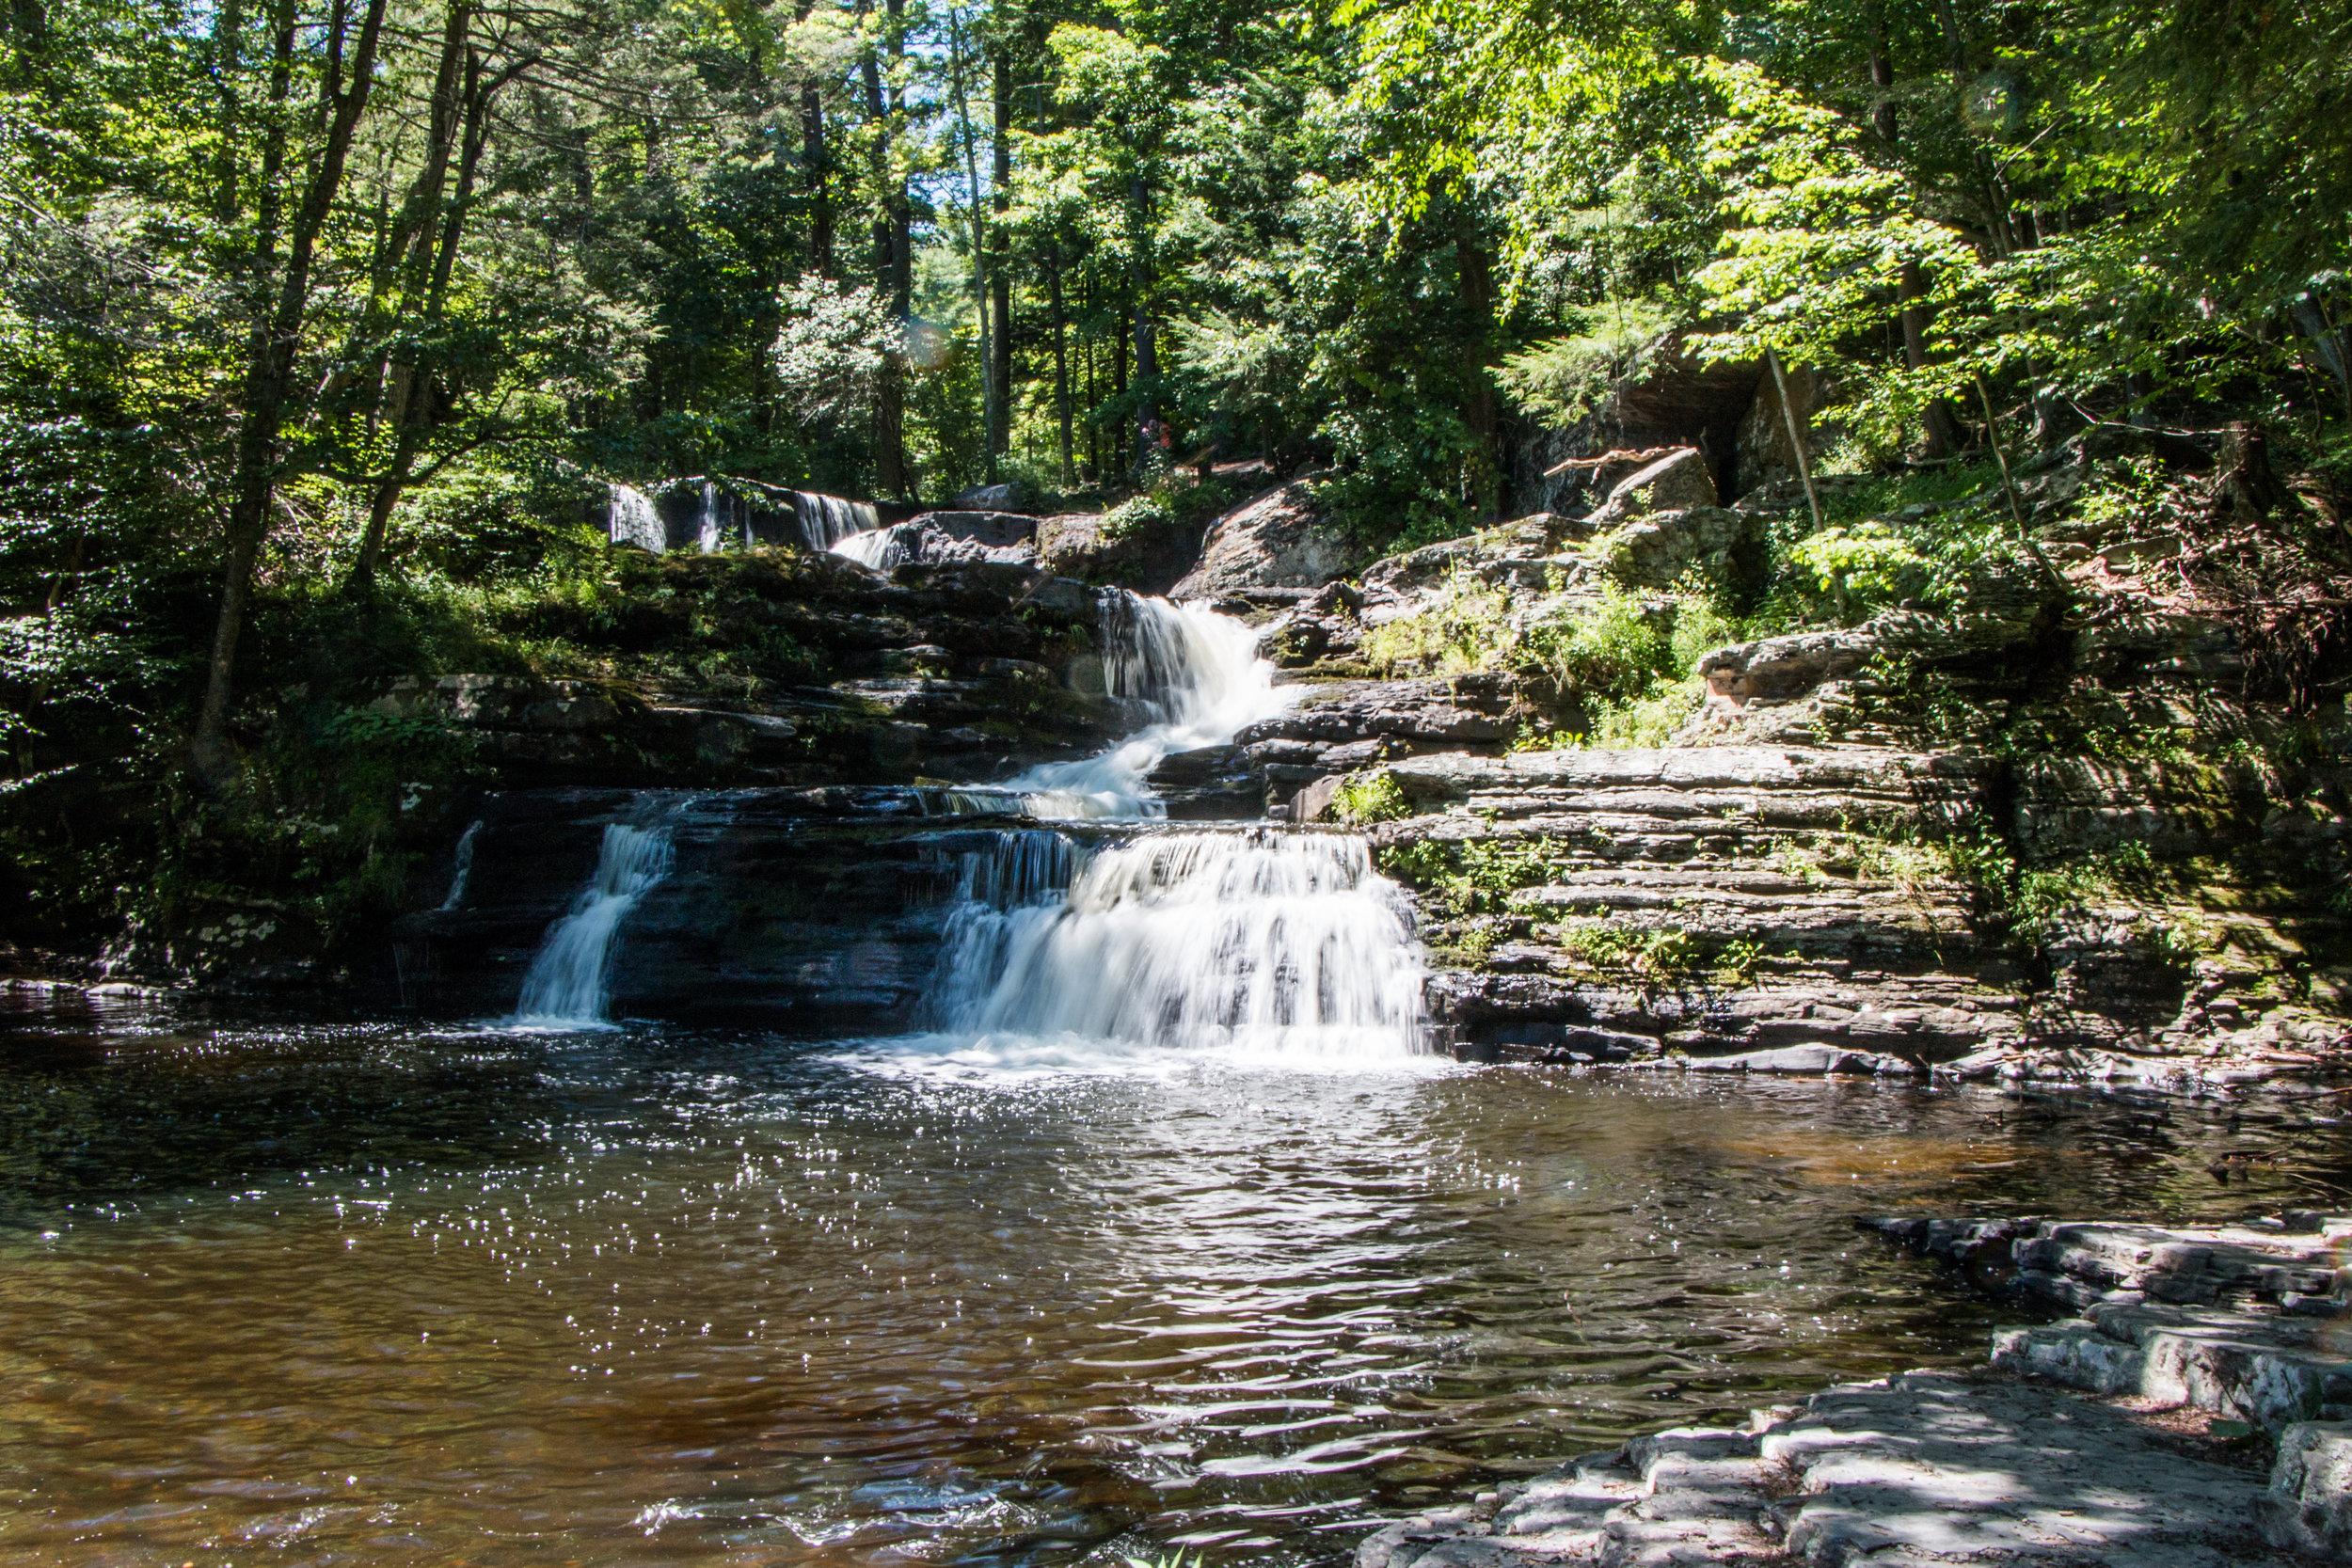 George W. Childs Park Trail